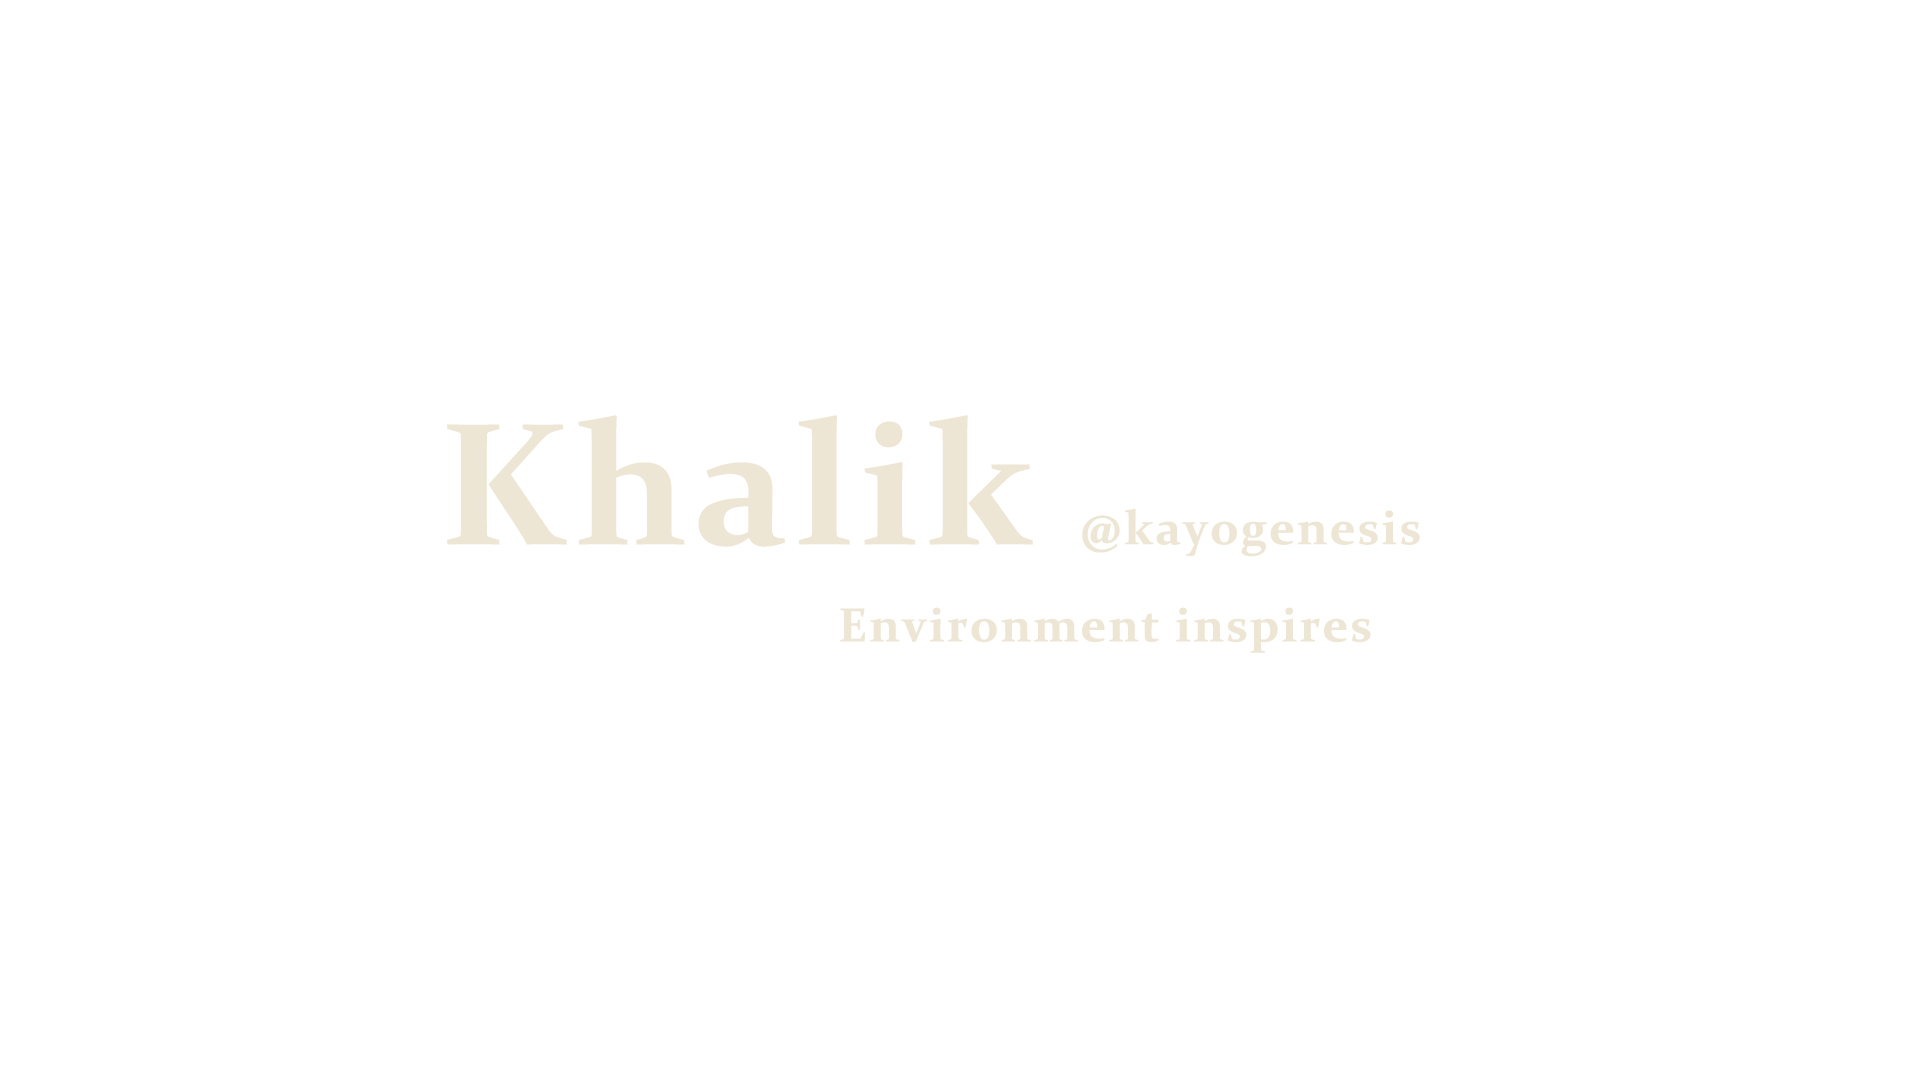 Khalik_2.png